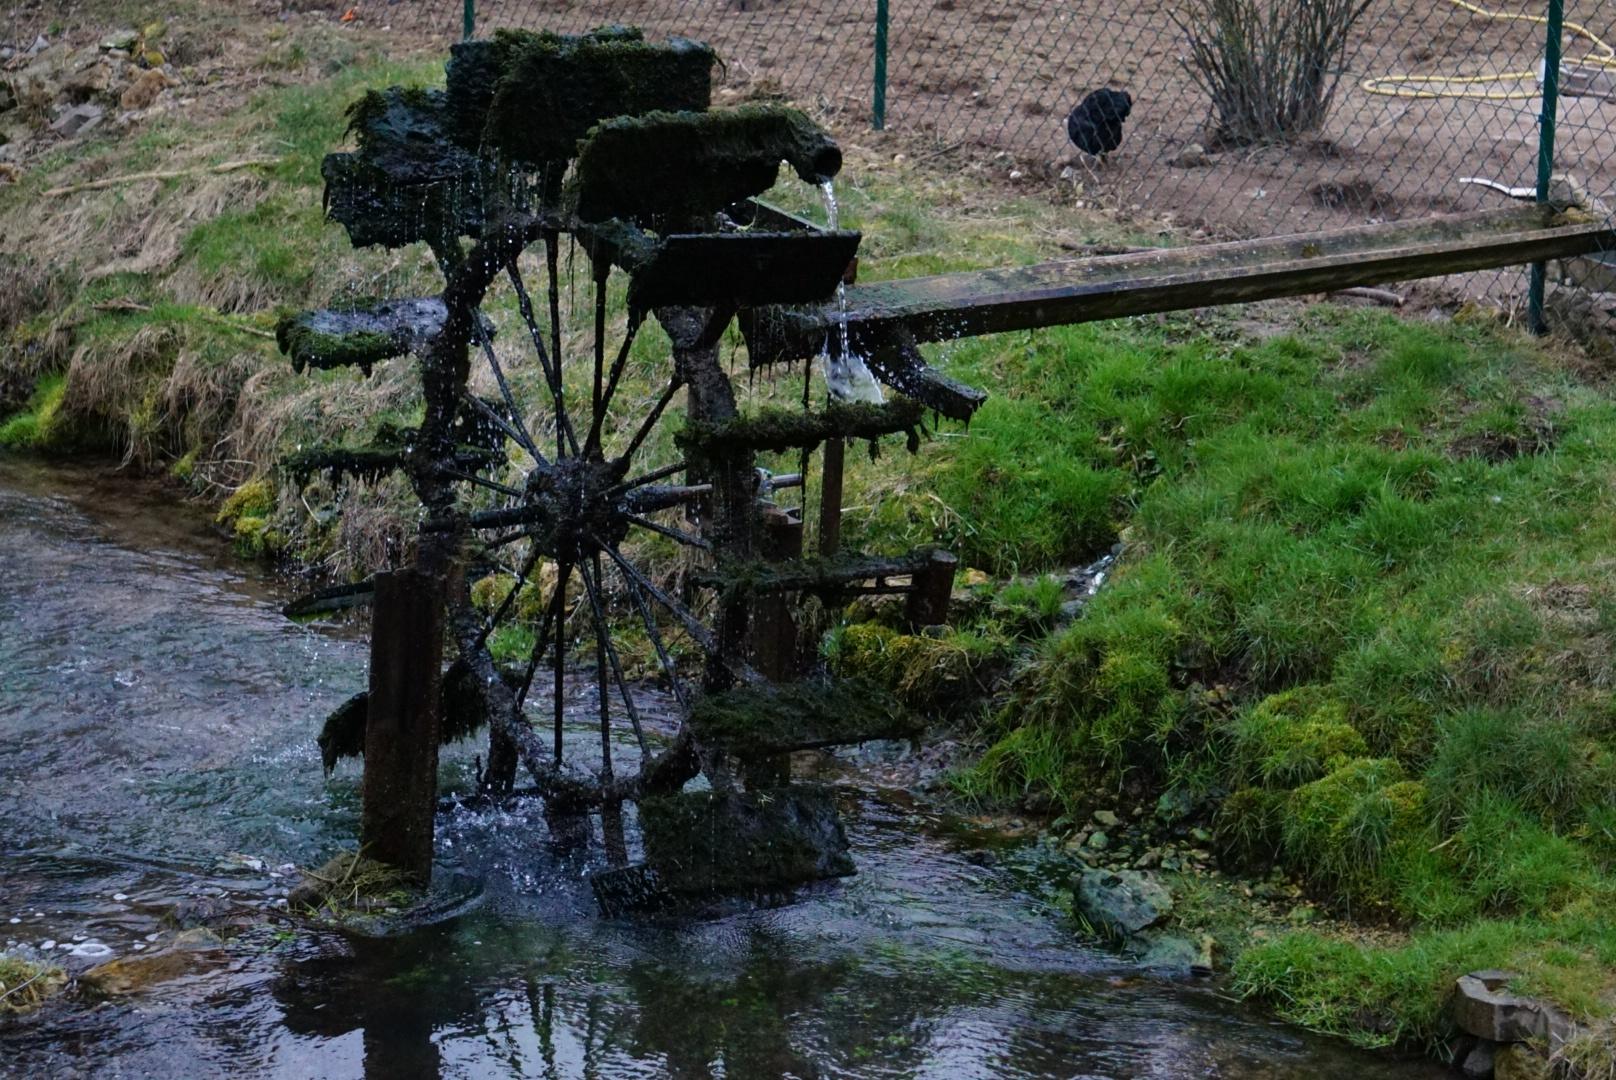 Wasserrad by SUNNY_MK5